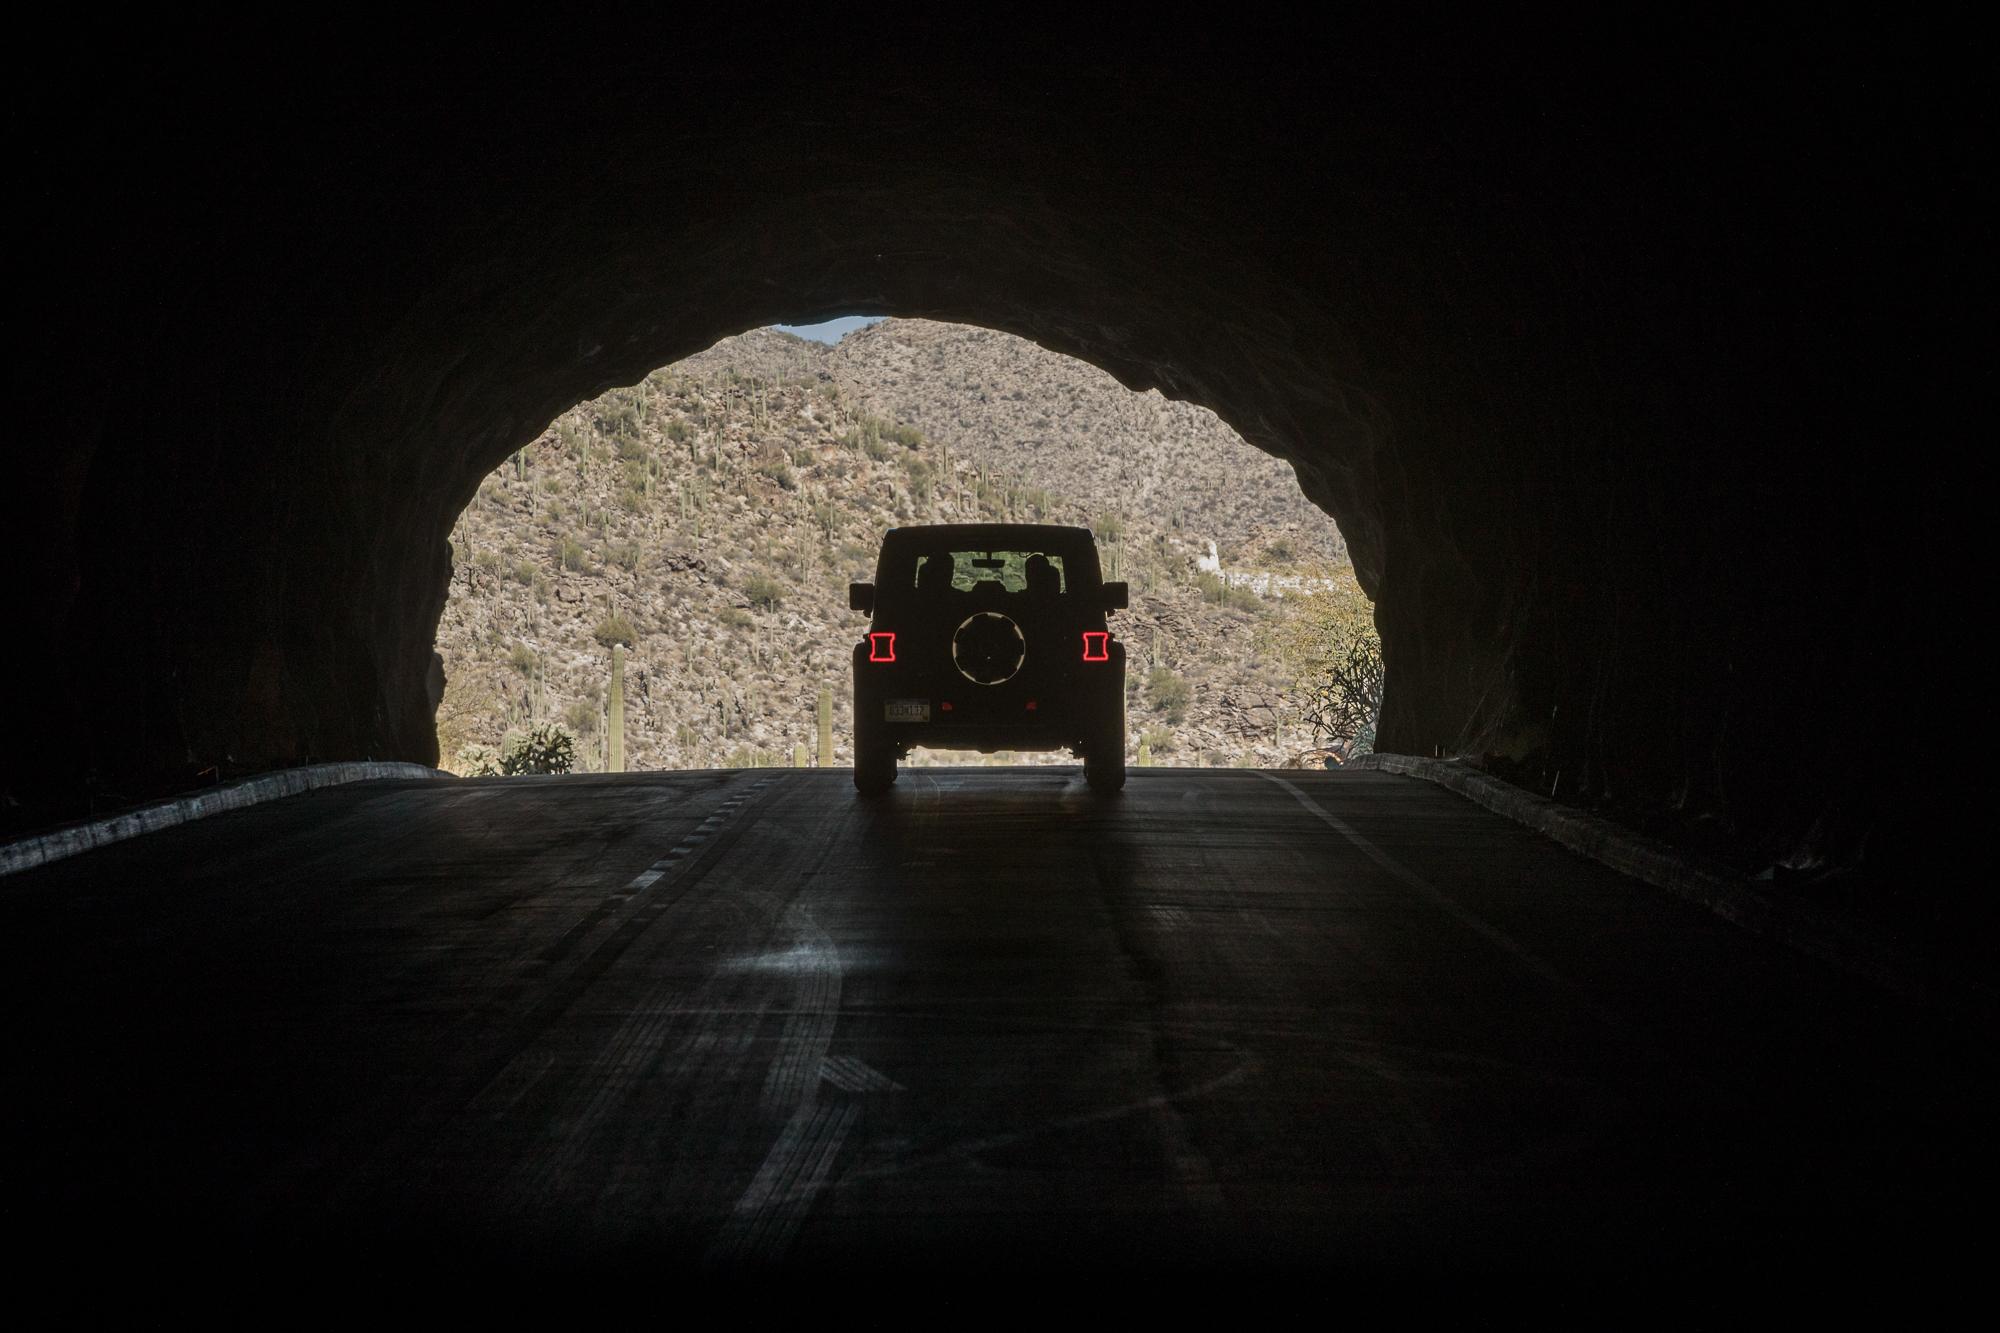 93-jeep-wrangler-2018-black-dynamic-exterior.jpg